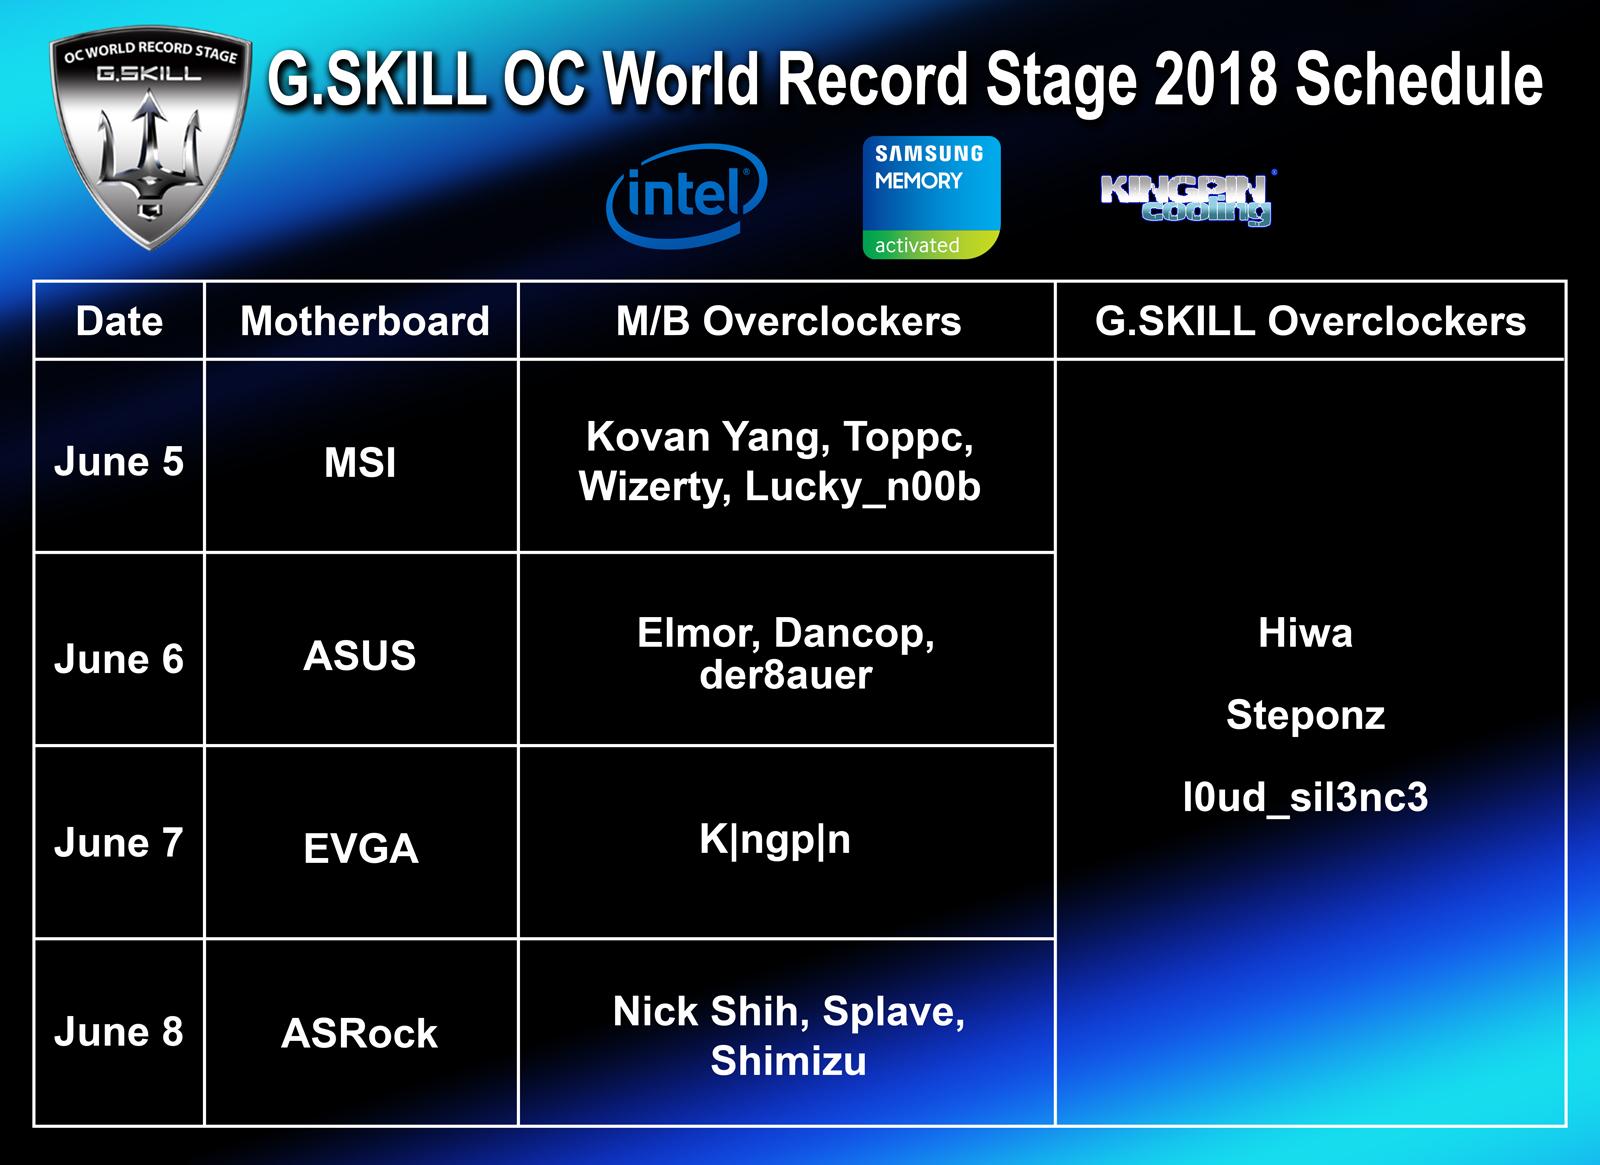 02 oc stage 2018 schedule G.SKILL เชิญชมงานแข่งขัน Overclocking Events และการม๊อดเคส Mod Showcase ในงาน Computex 2018